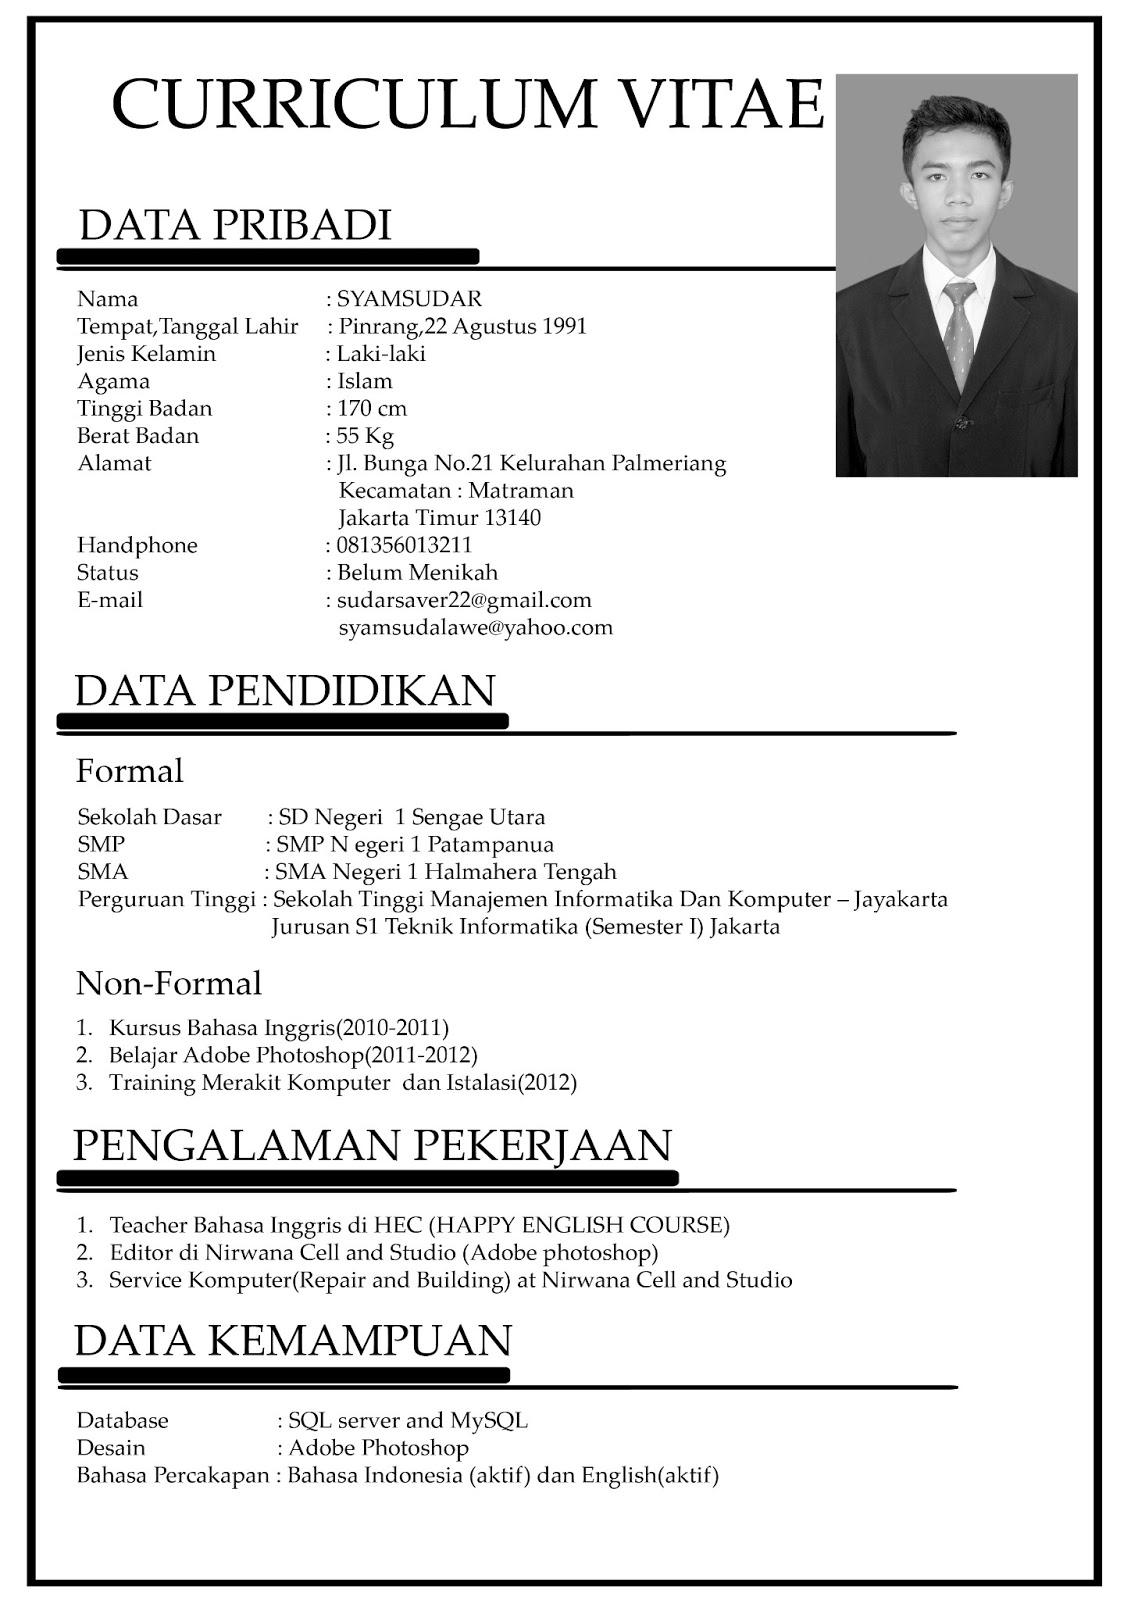 Download Cv Template Word Bahasa Indonesia Professional Resumes